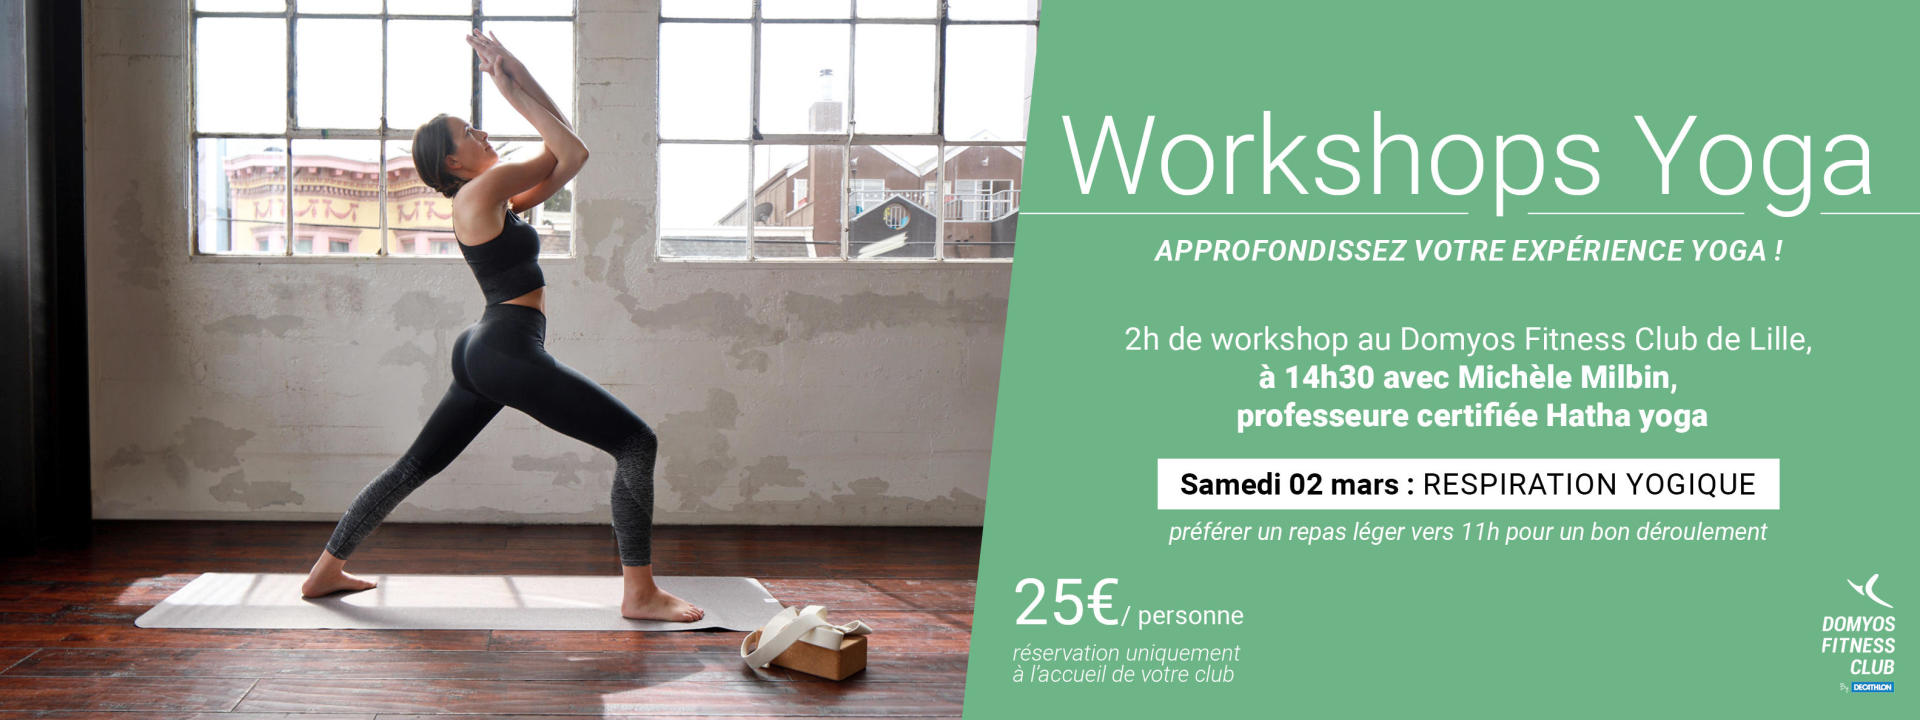 Workshop Yoga Clubs